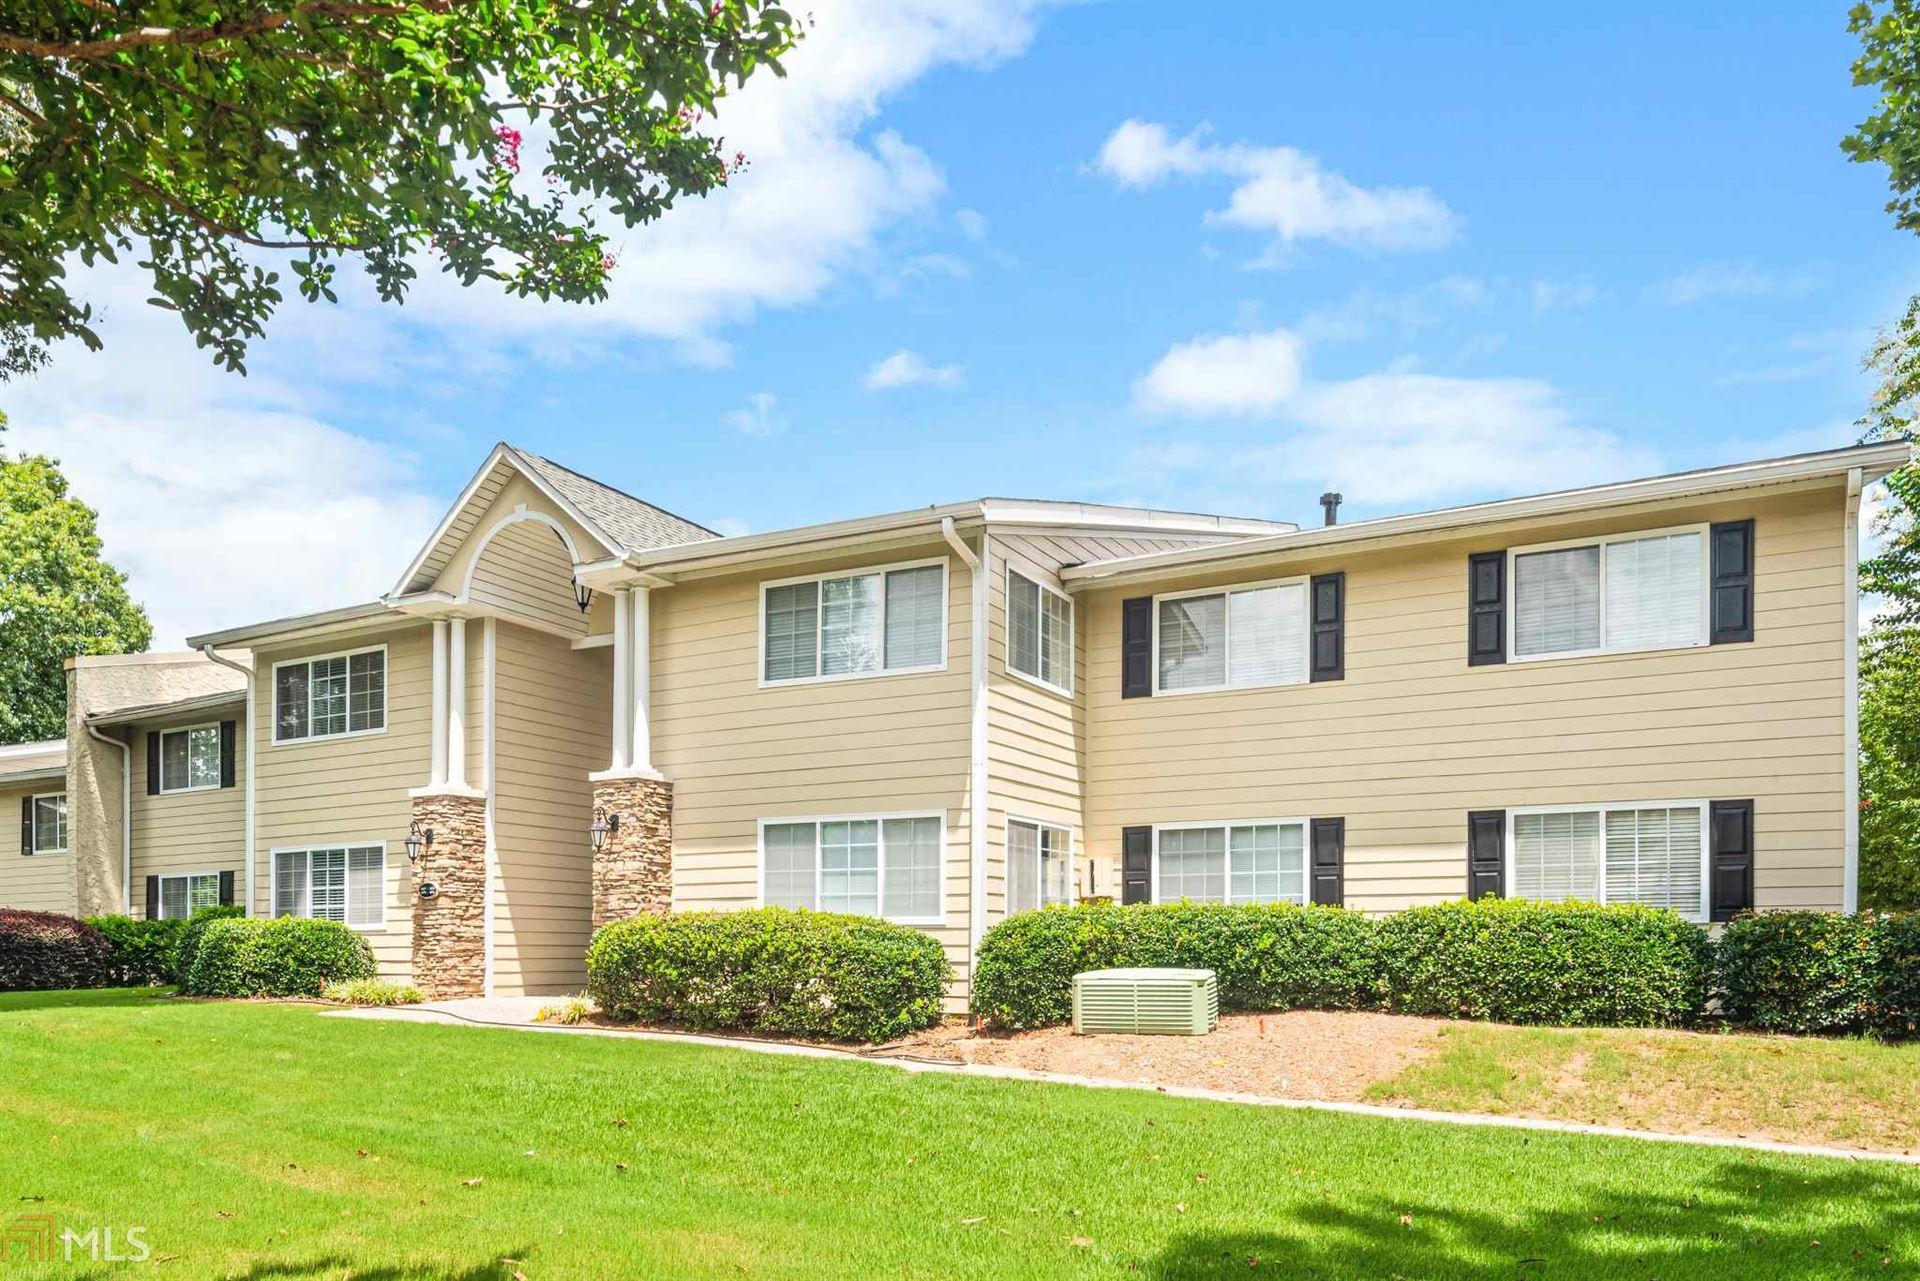 1468 Briarwood Rd, Brookhaven, GA 30319 - MLS#: 8874025